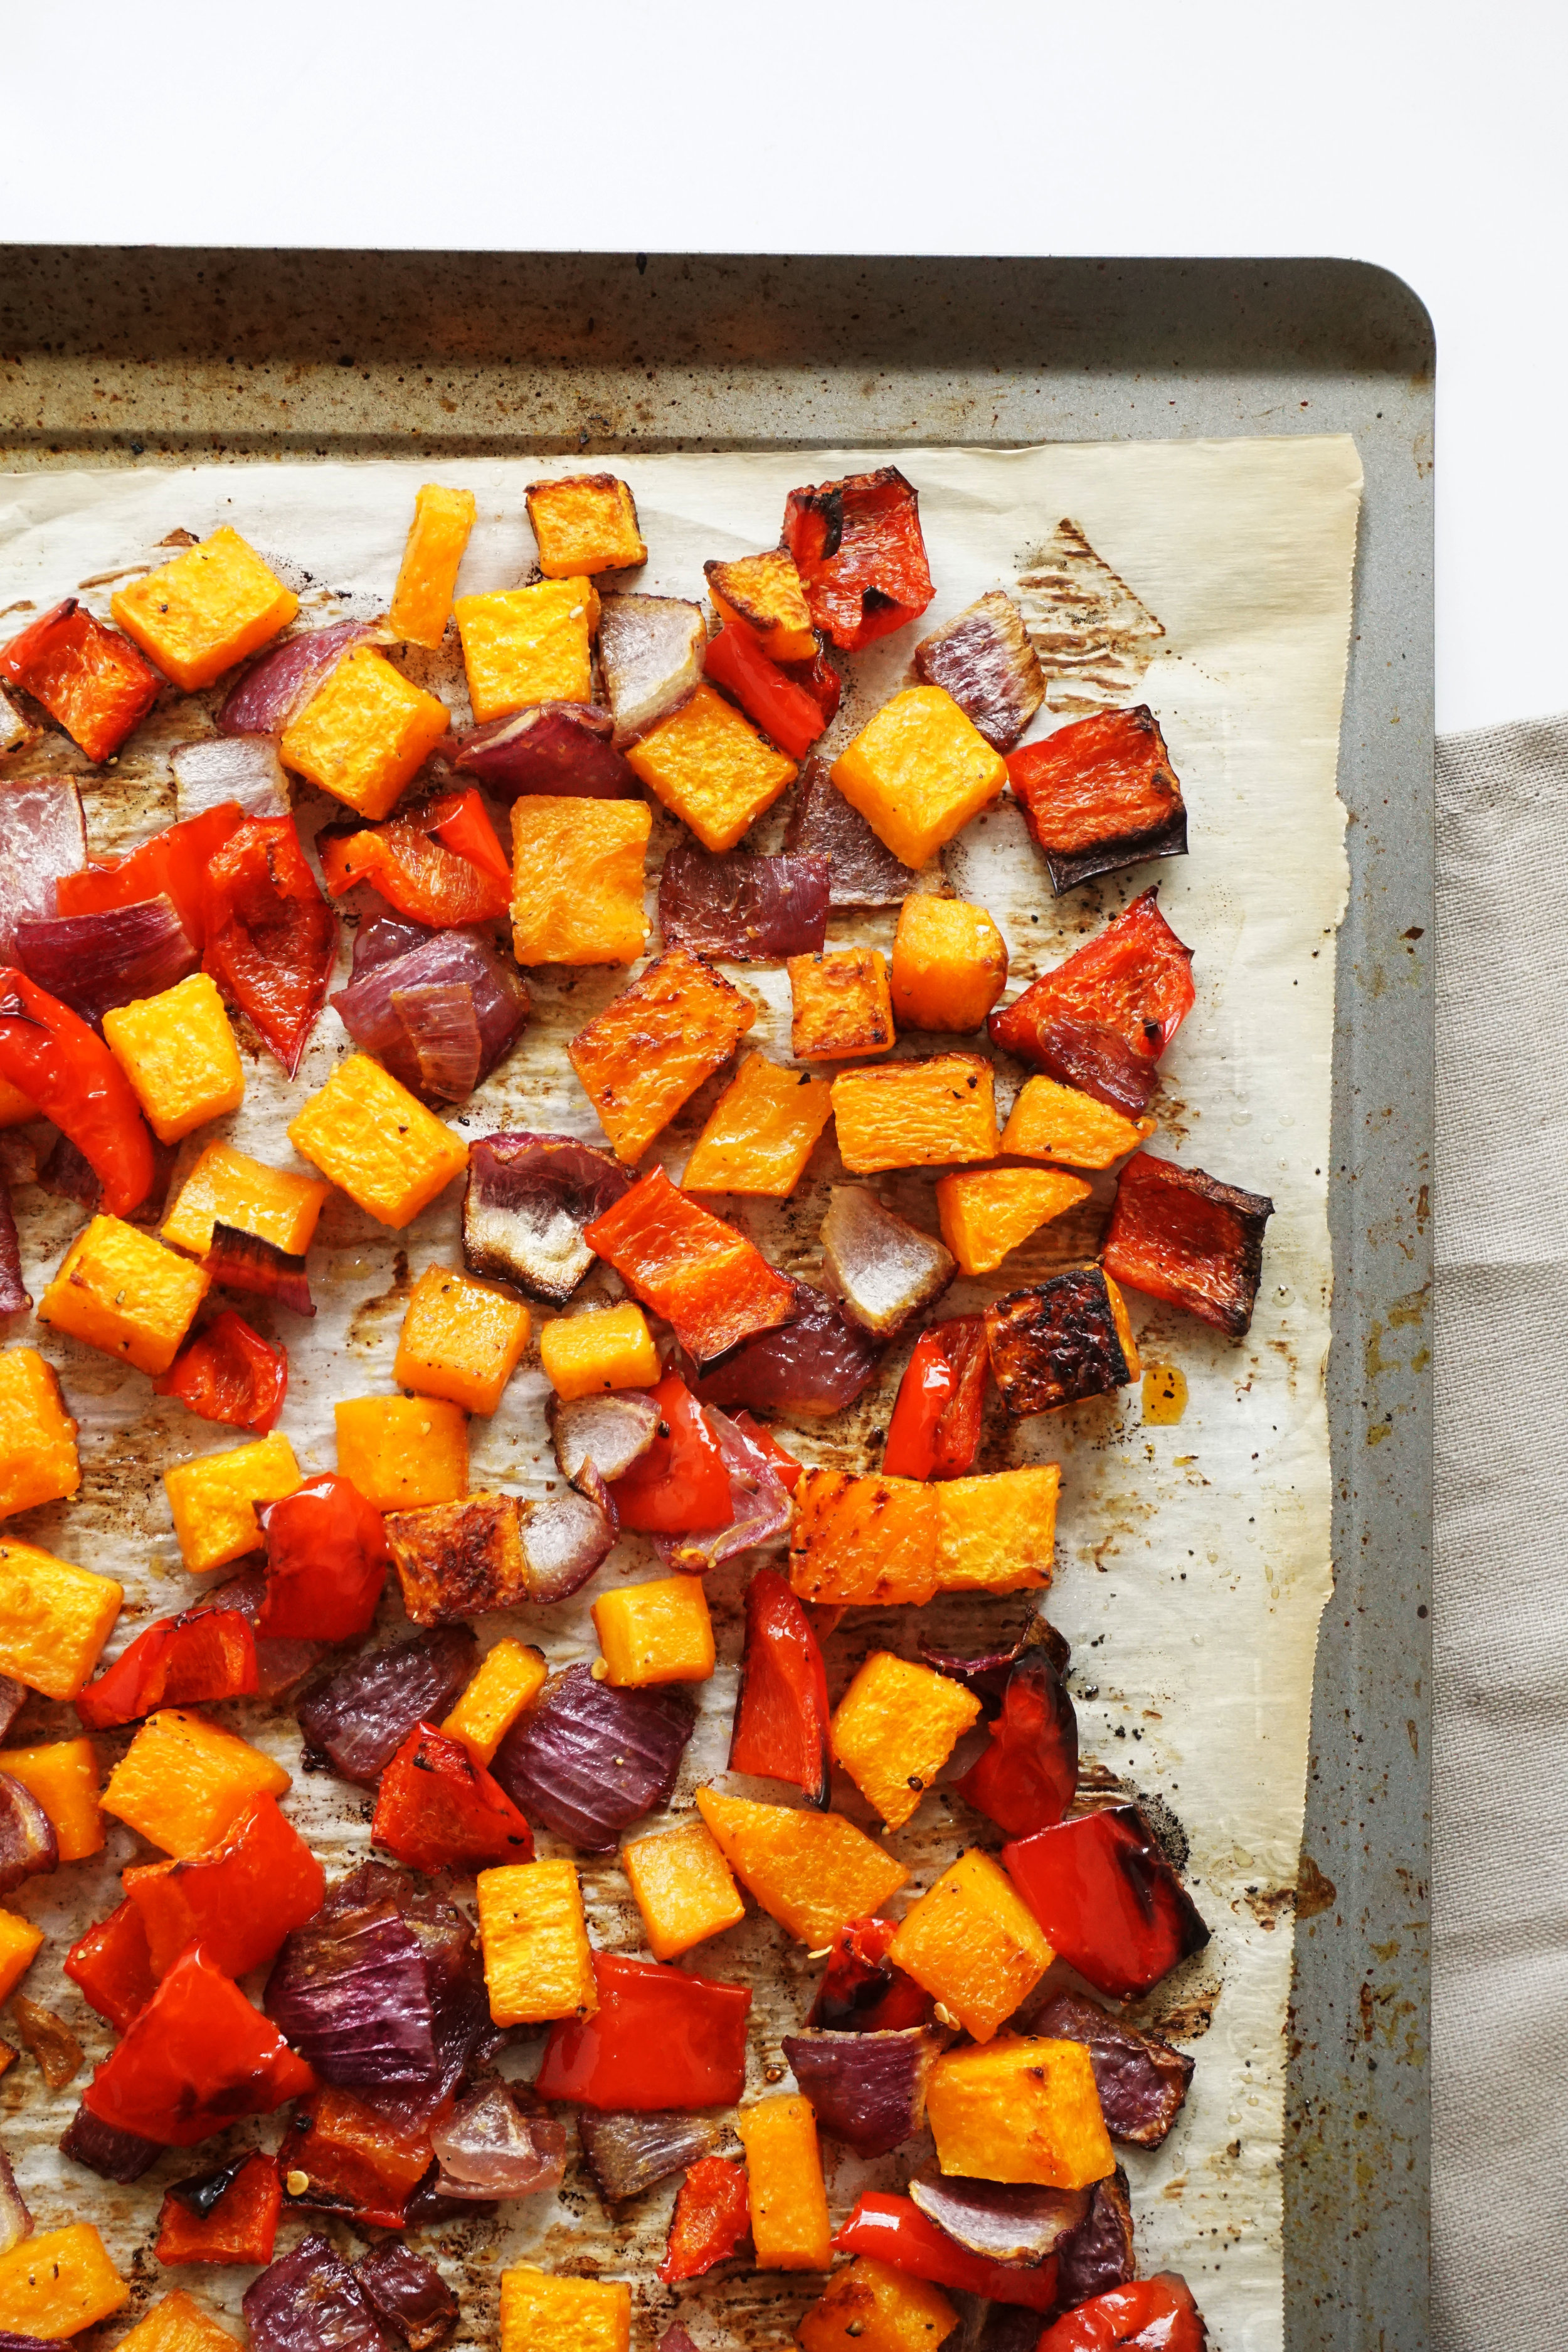 One-Pan Roasted Squash and Pepper Dinner (Vegetarian, Dairy-free, Grain-free)